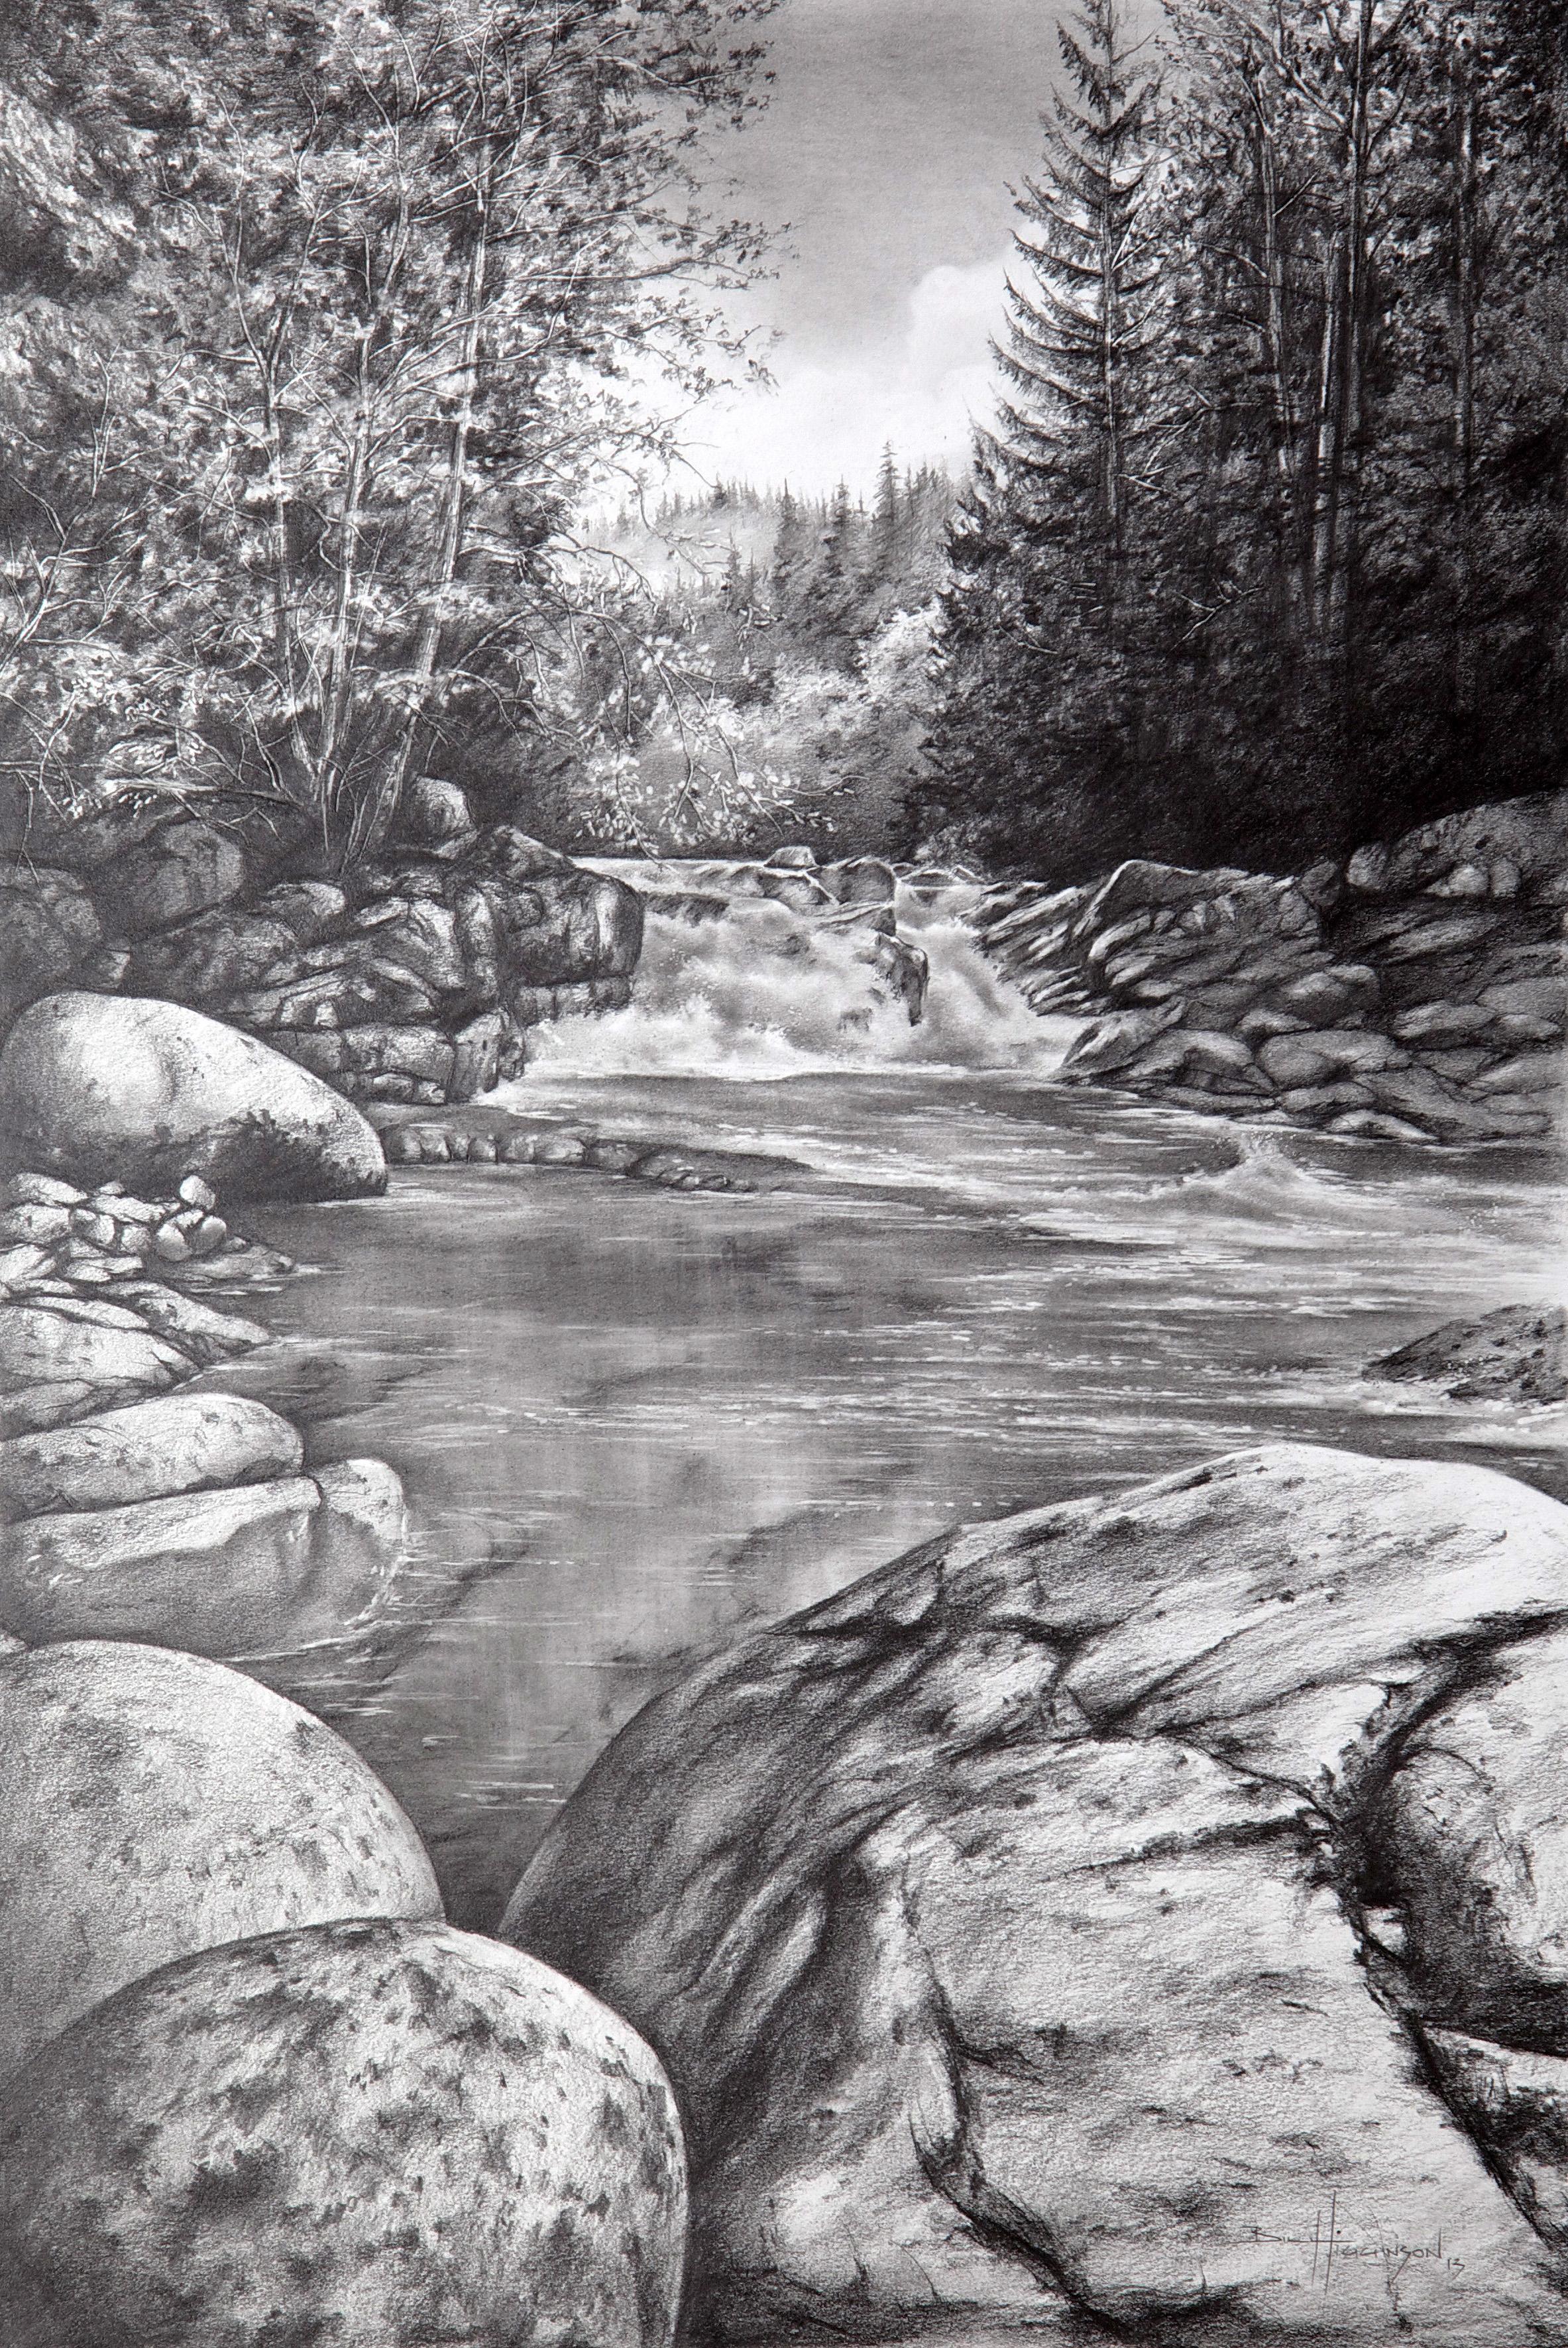 bill_higginson-lynn valley-graphite-drawing-realism-black-and-white